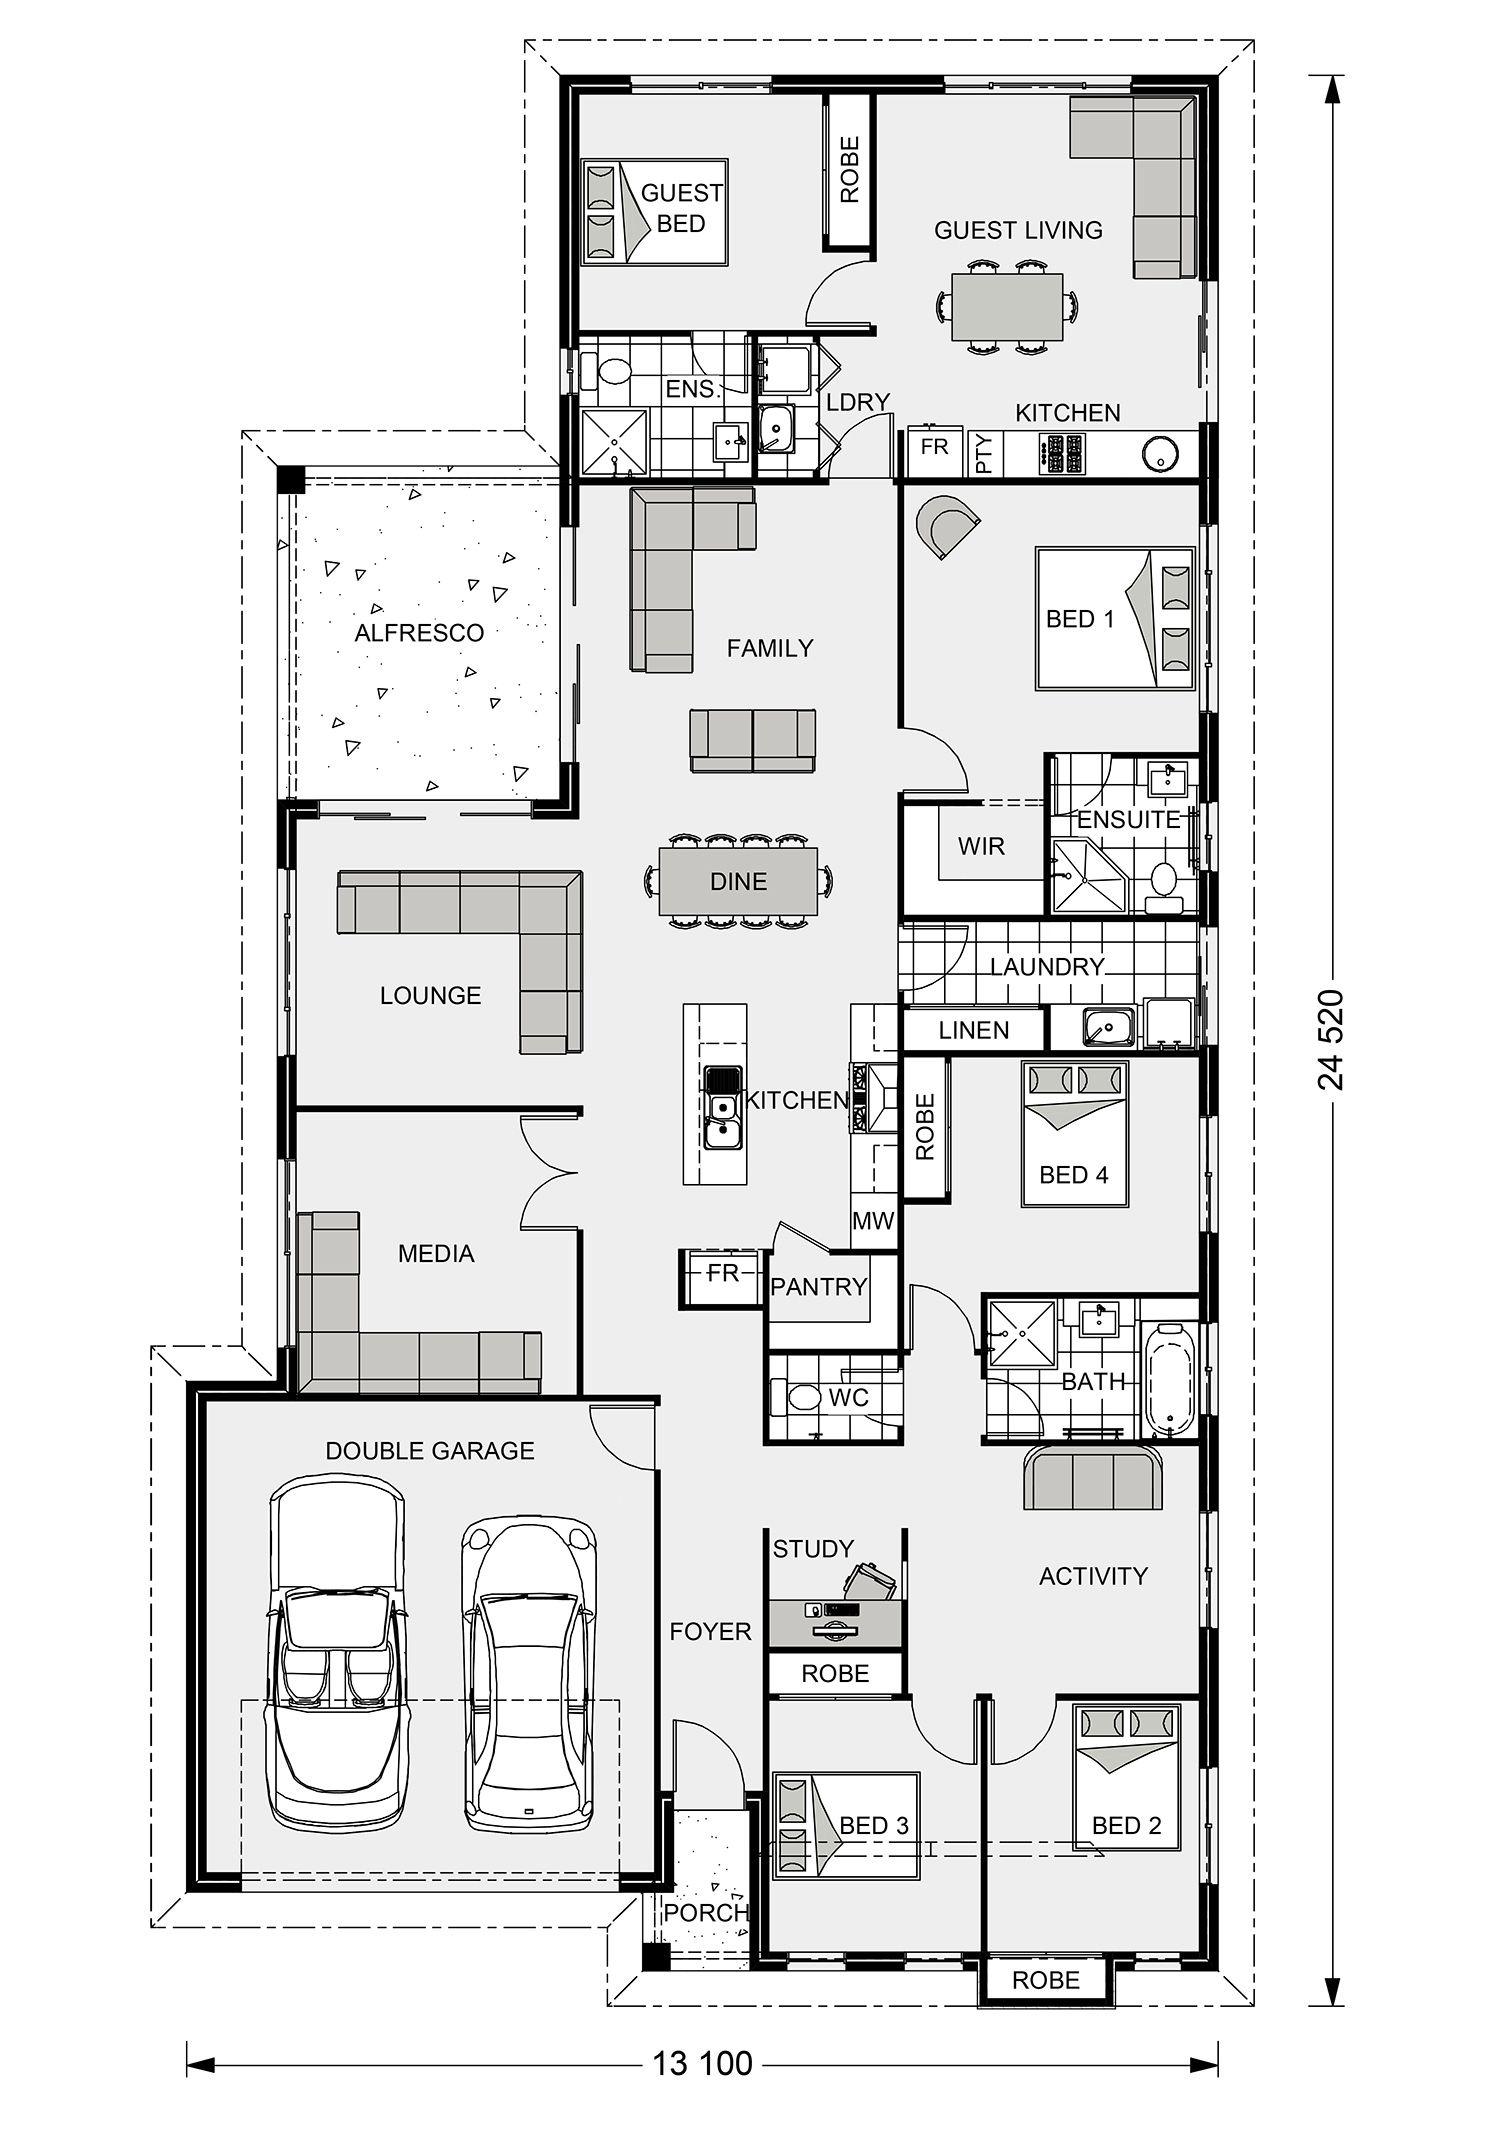 Floor Plan With Guest Suite House Design House Plans Floor Plans